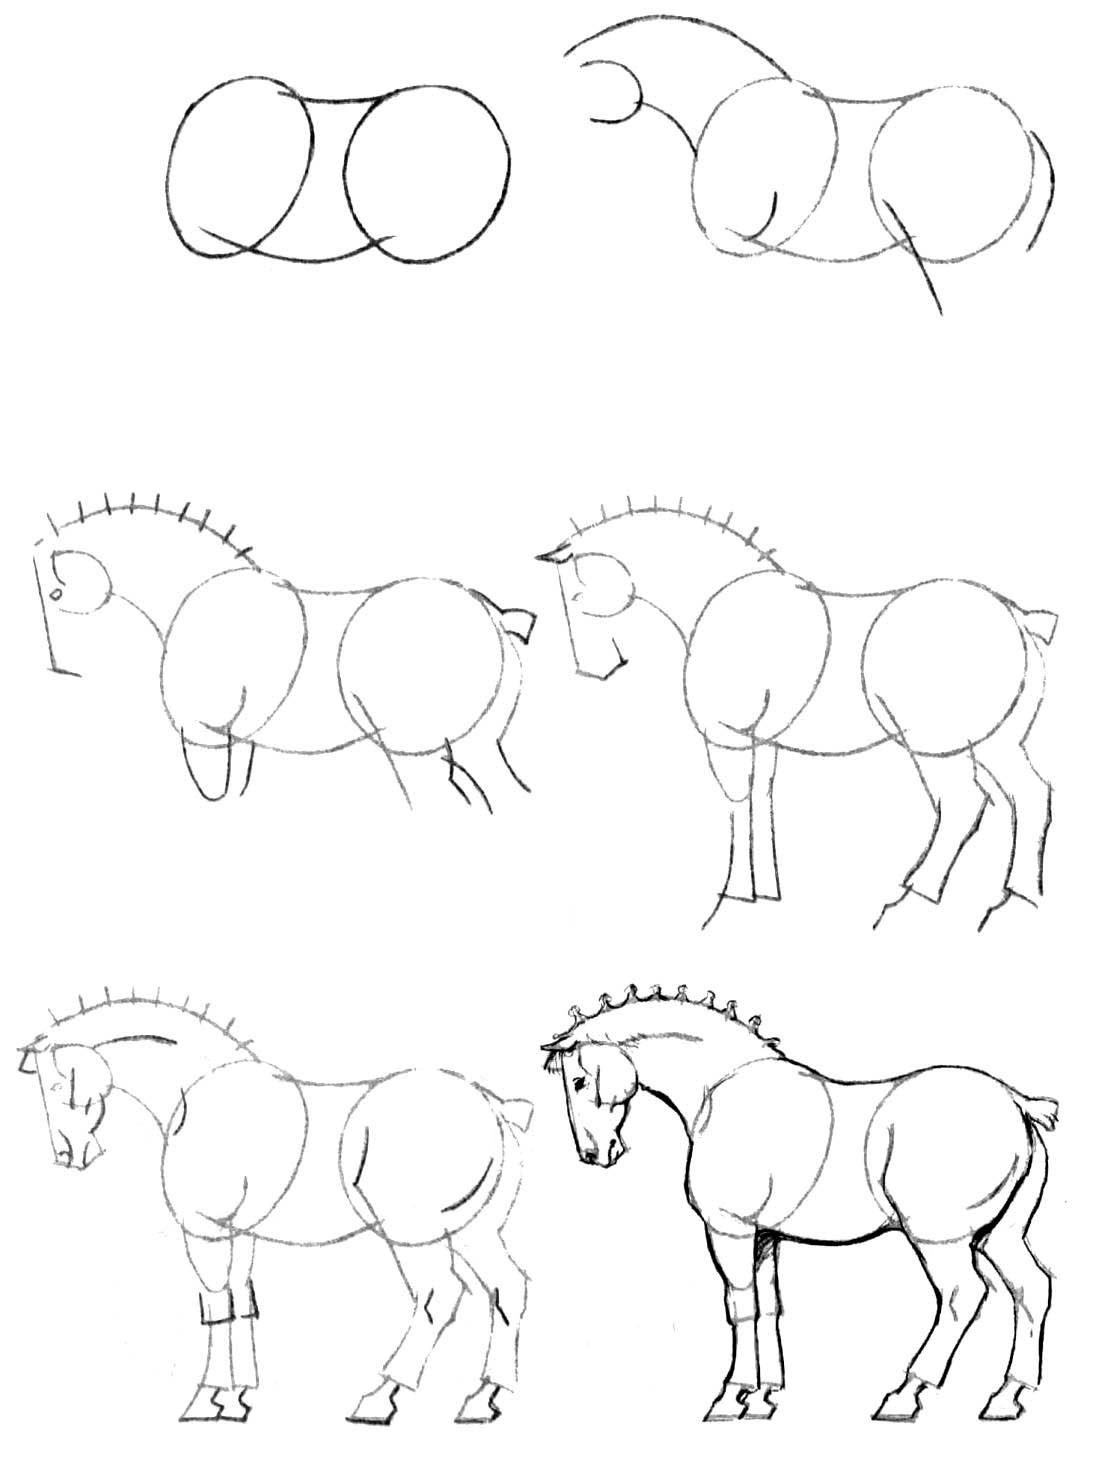 Картинки, как нарисовать картинки поэтапно карандашом легко и красиво